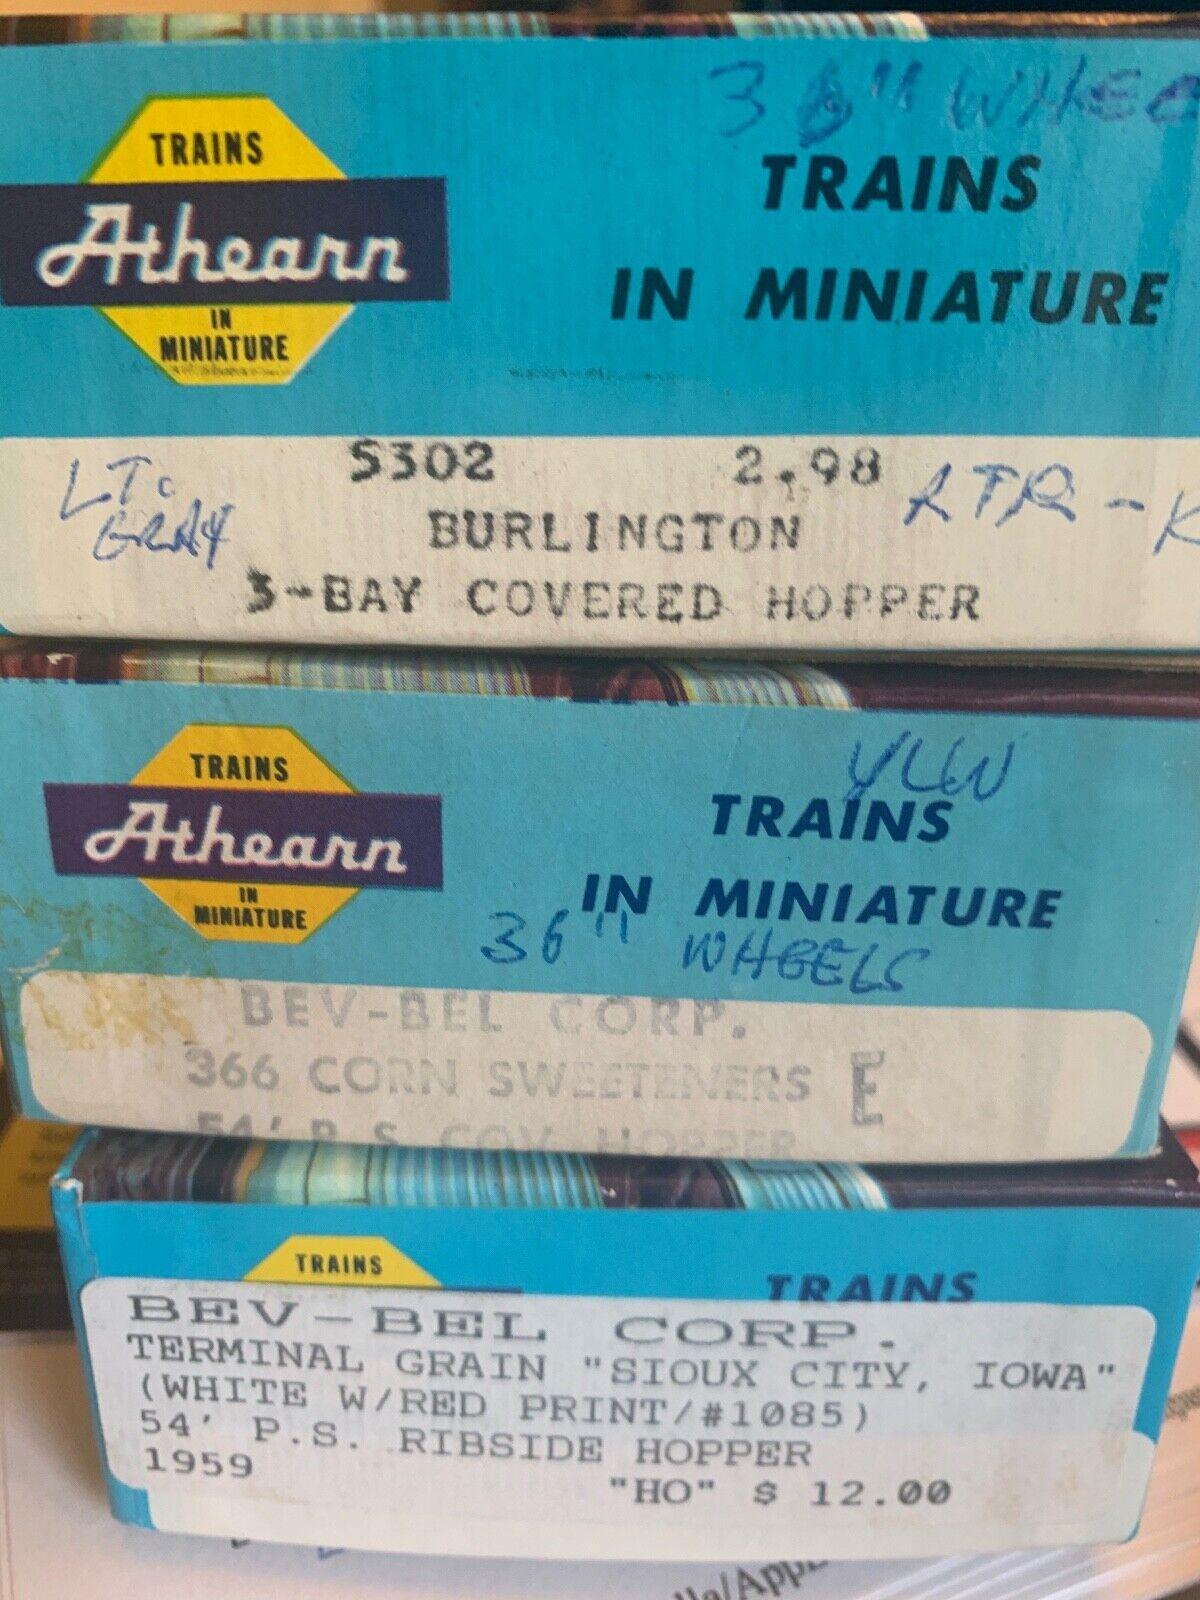 LOT OF 3 - ATHEARN 2 BEV-BEL 54' P.S. RIBSIDE HOPPER & 1 3-BAY BURLINGTON HOPPER